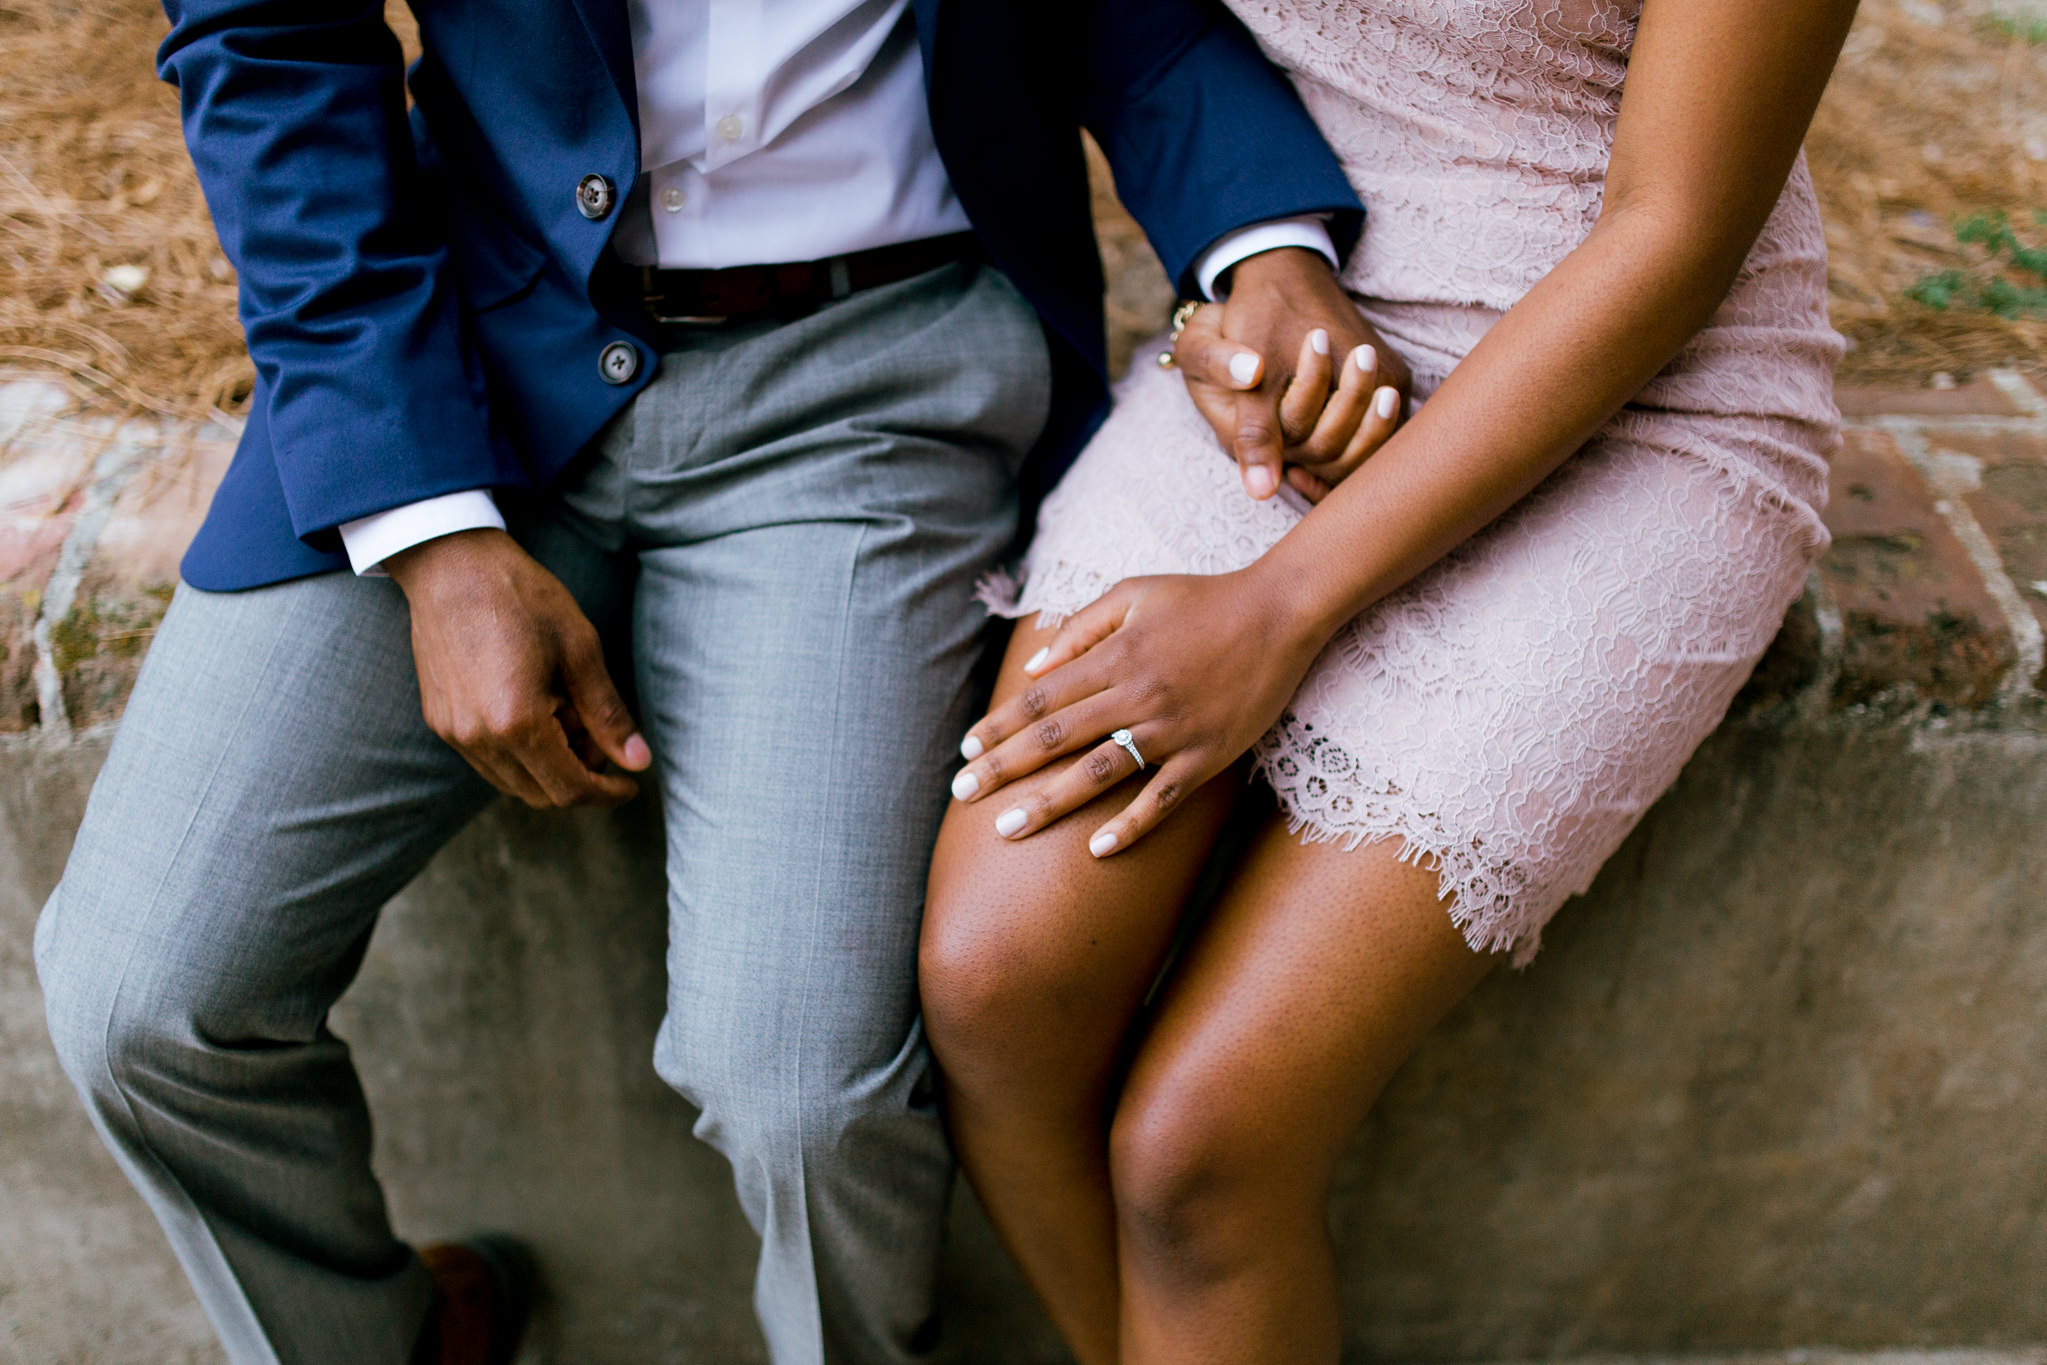 Grant-Park-Atlanta-Engagement-Pictures-Kiyah-C-Photography-19.jpg